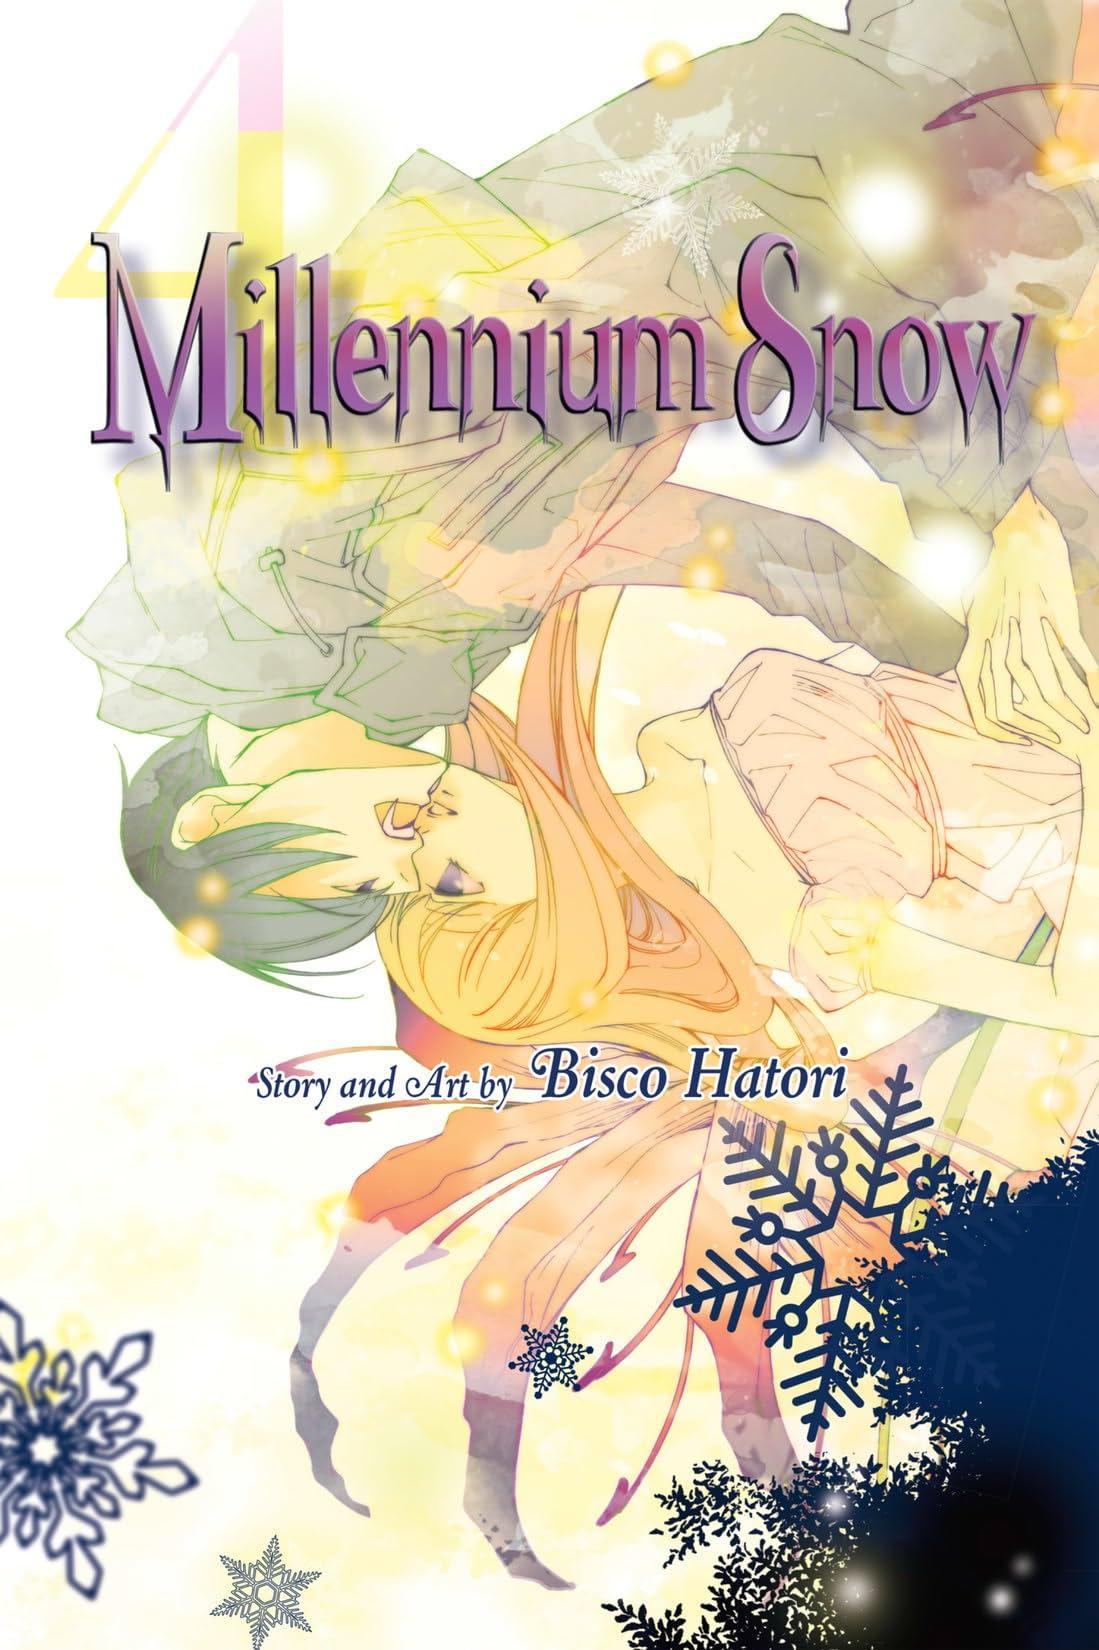 Millennium Snow Vol. 4